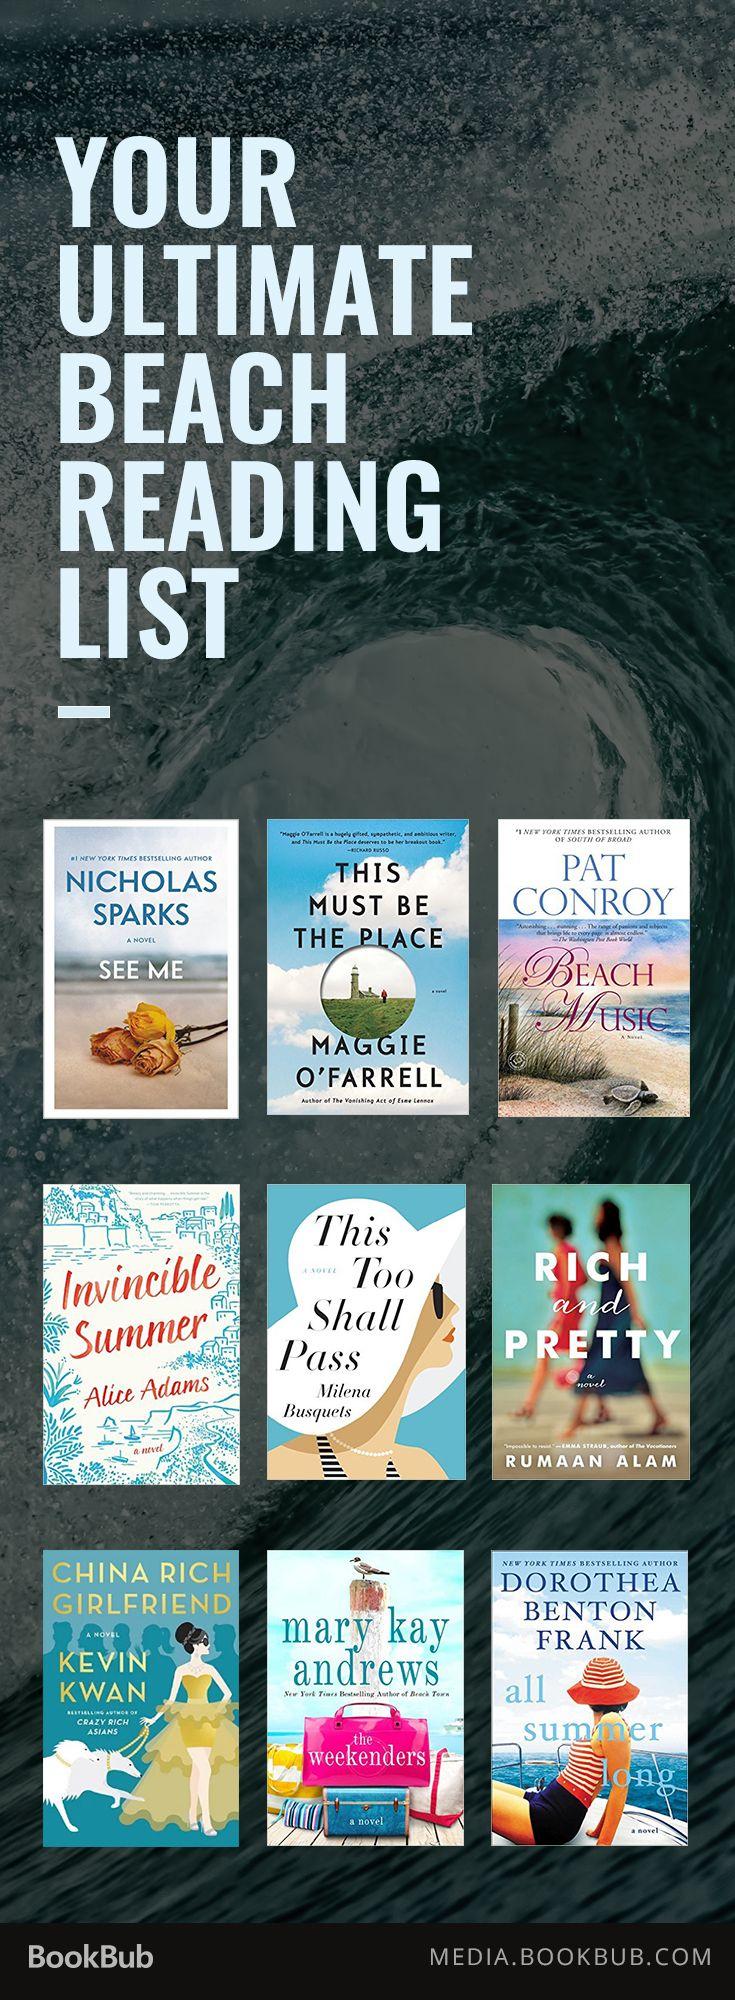 25+ Best Ideas About Nicholas Sparks Books On Pinterest  Movies By  Nicholas Sparks, Books By Nicholas Sparks And Nicholas Sparks Novels